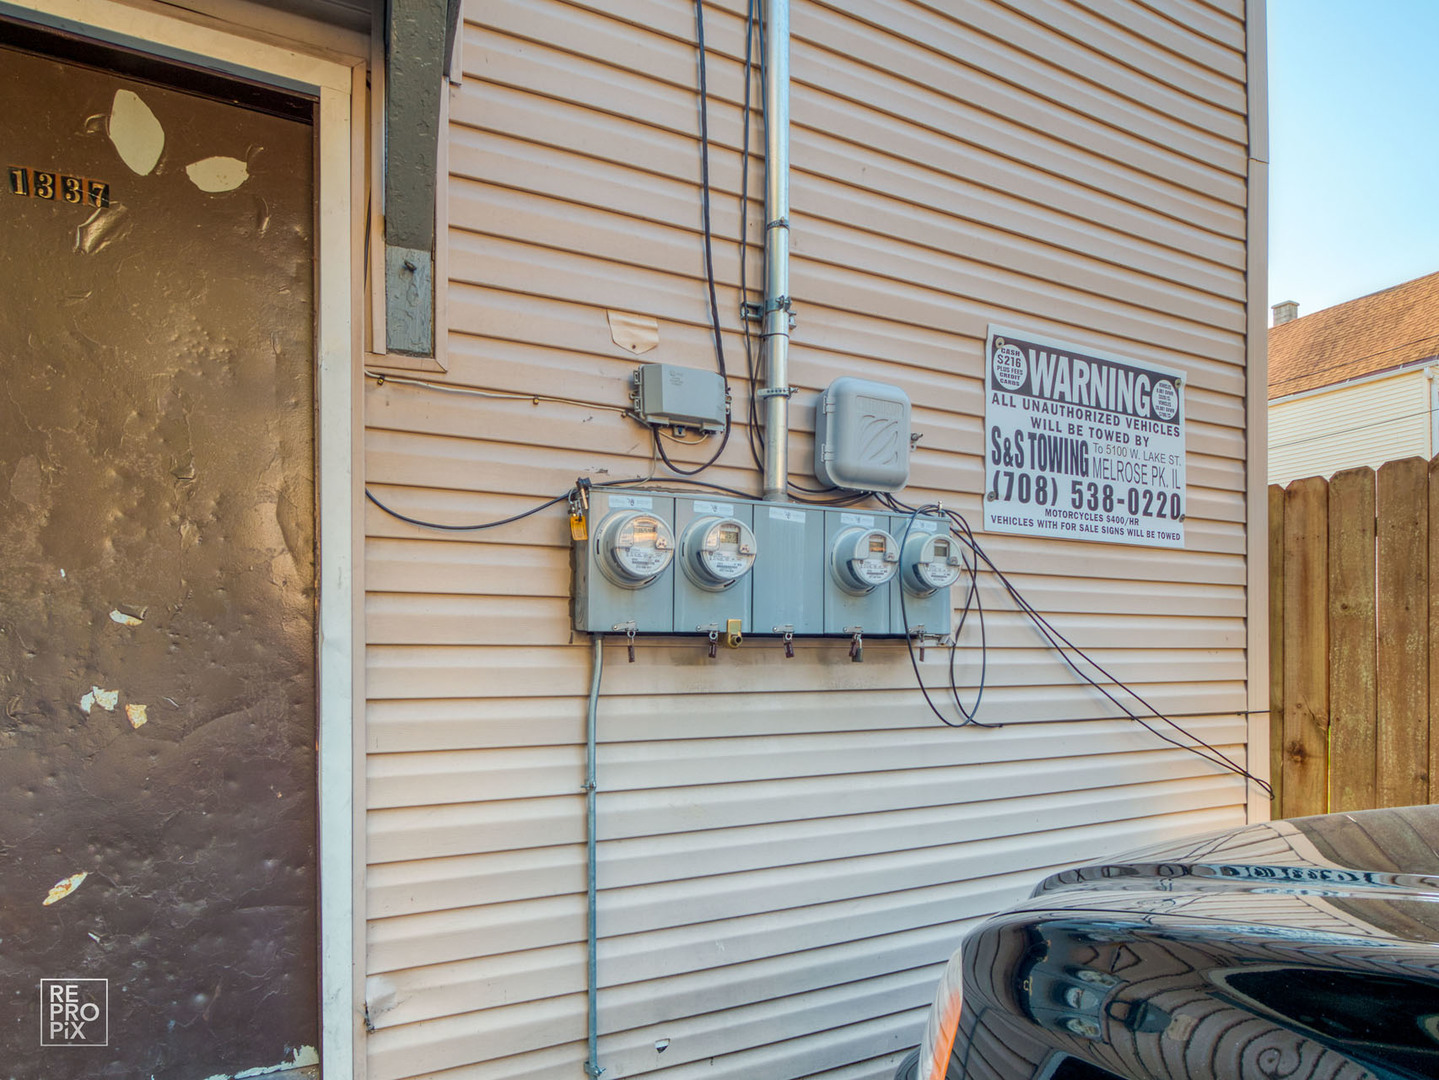 1337 South 50TH, Cicero, Illinois, 60804